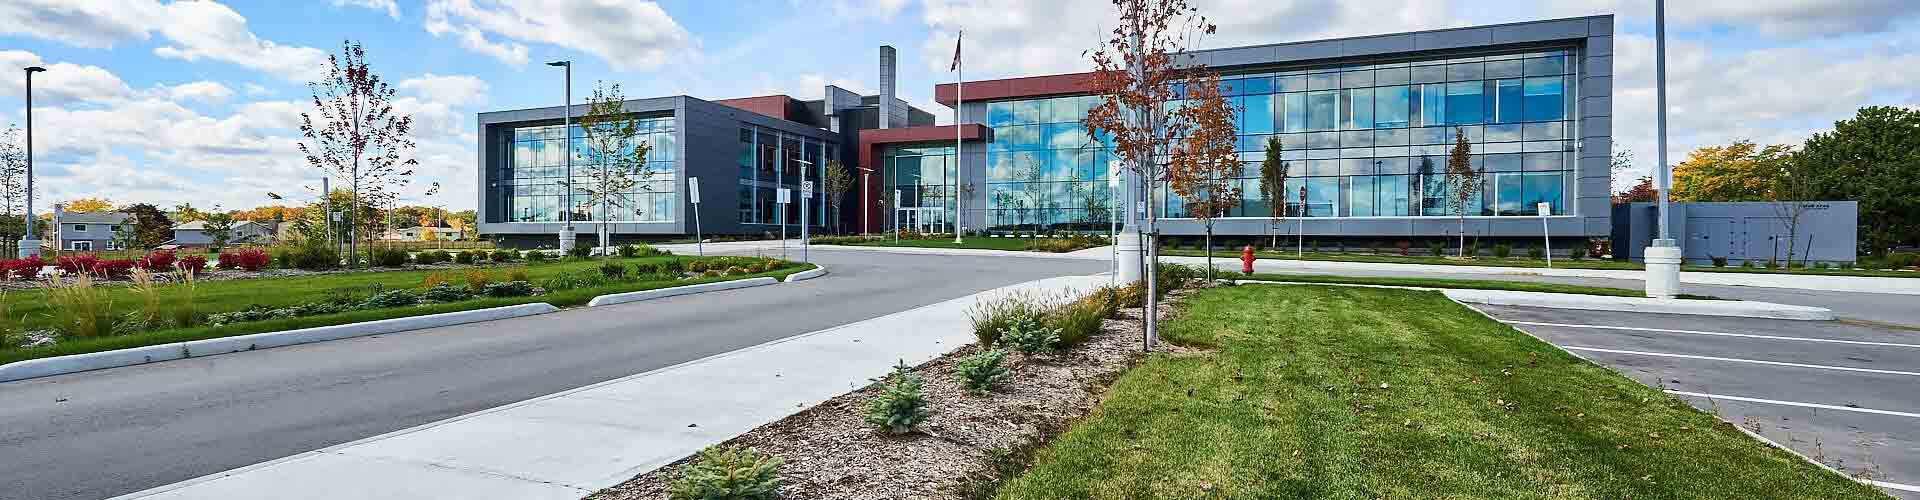 Image result for hamilton-wentworth district school board